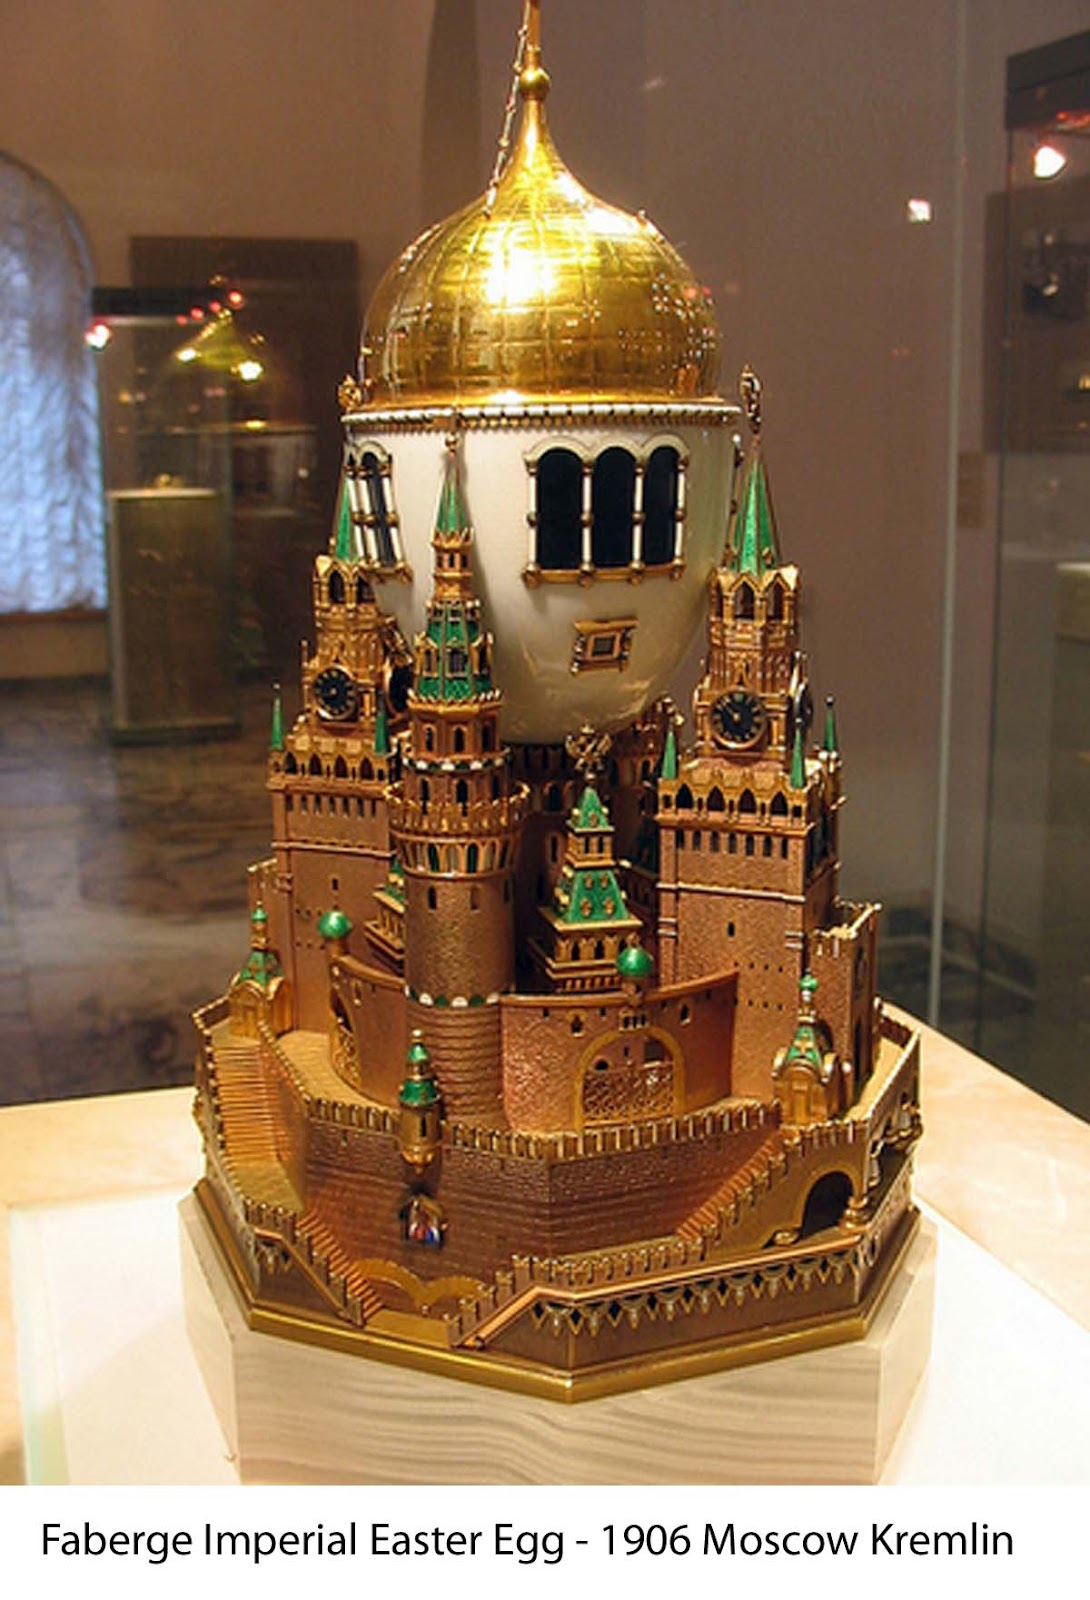 http://2.bp.blogspot.com/-fuPqbJICdfI/T4E7i_m2udI/AAAAAAAAALE/DPGUiI_U7Mw/s1600/Imperial+Faberge+Egg+-+Moscow+Kremlin+Egg.jpg